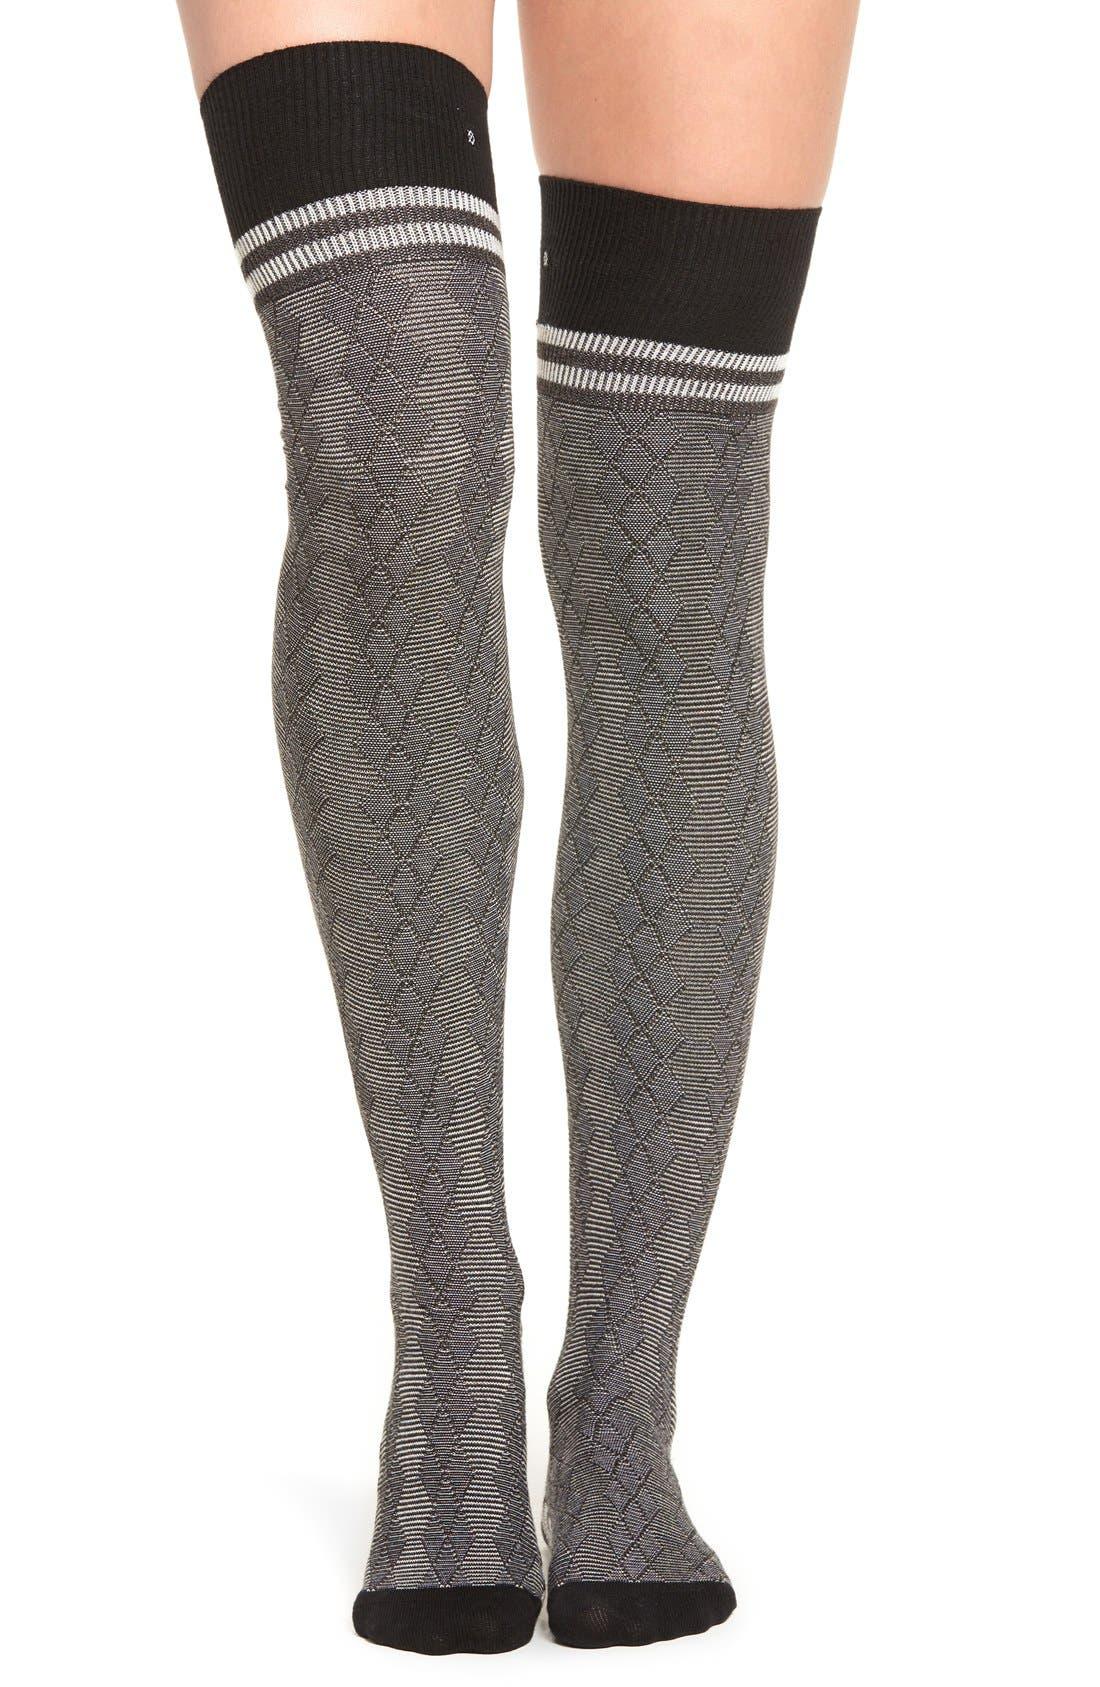 Main Image - Stance 'Fine Line' Over the Knee Socks